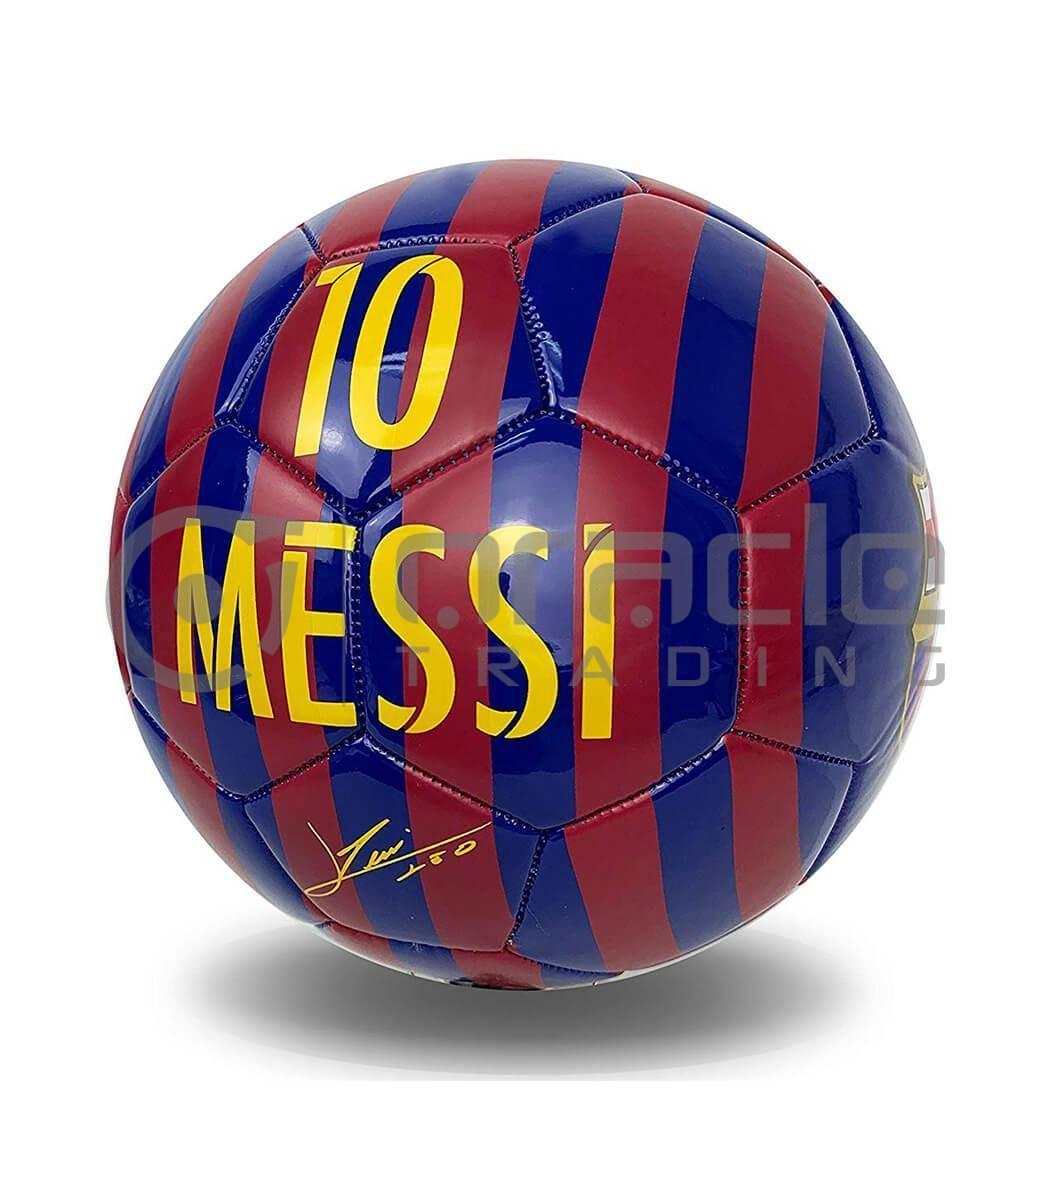 Messi - Barcelona Large Soccer Ball